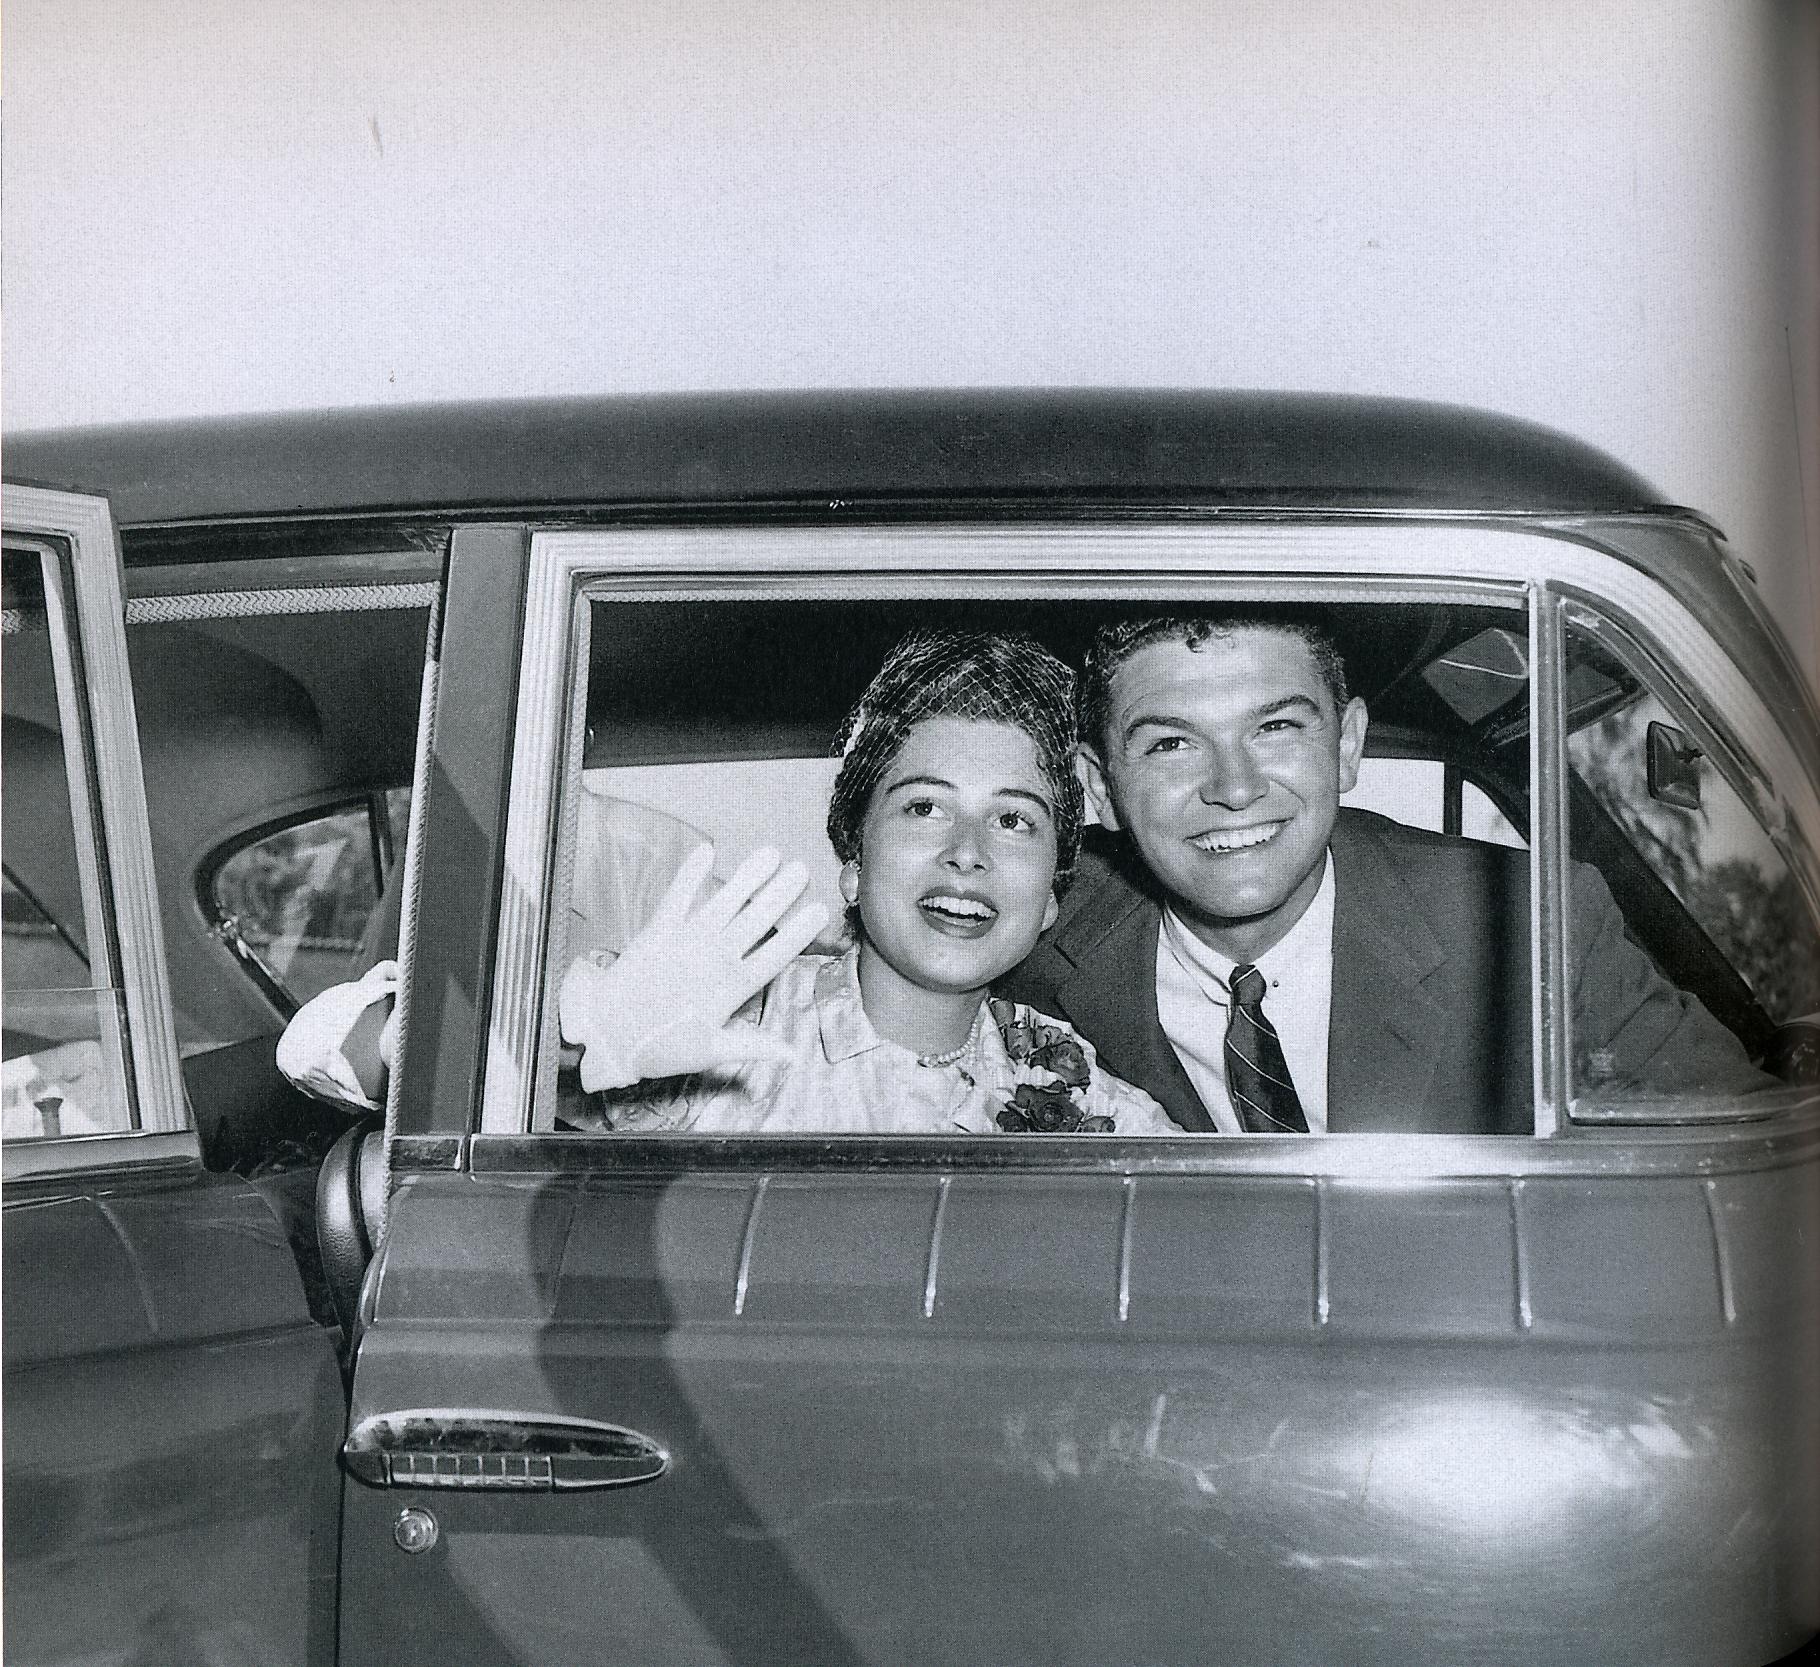 Leta and Mel on their wedding day, 1955.